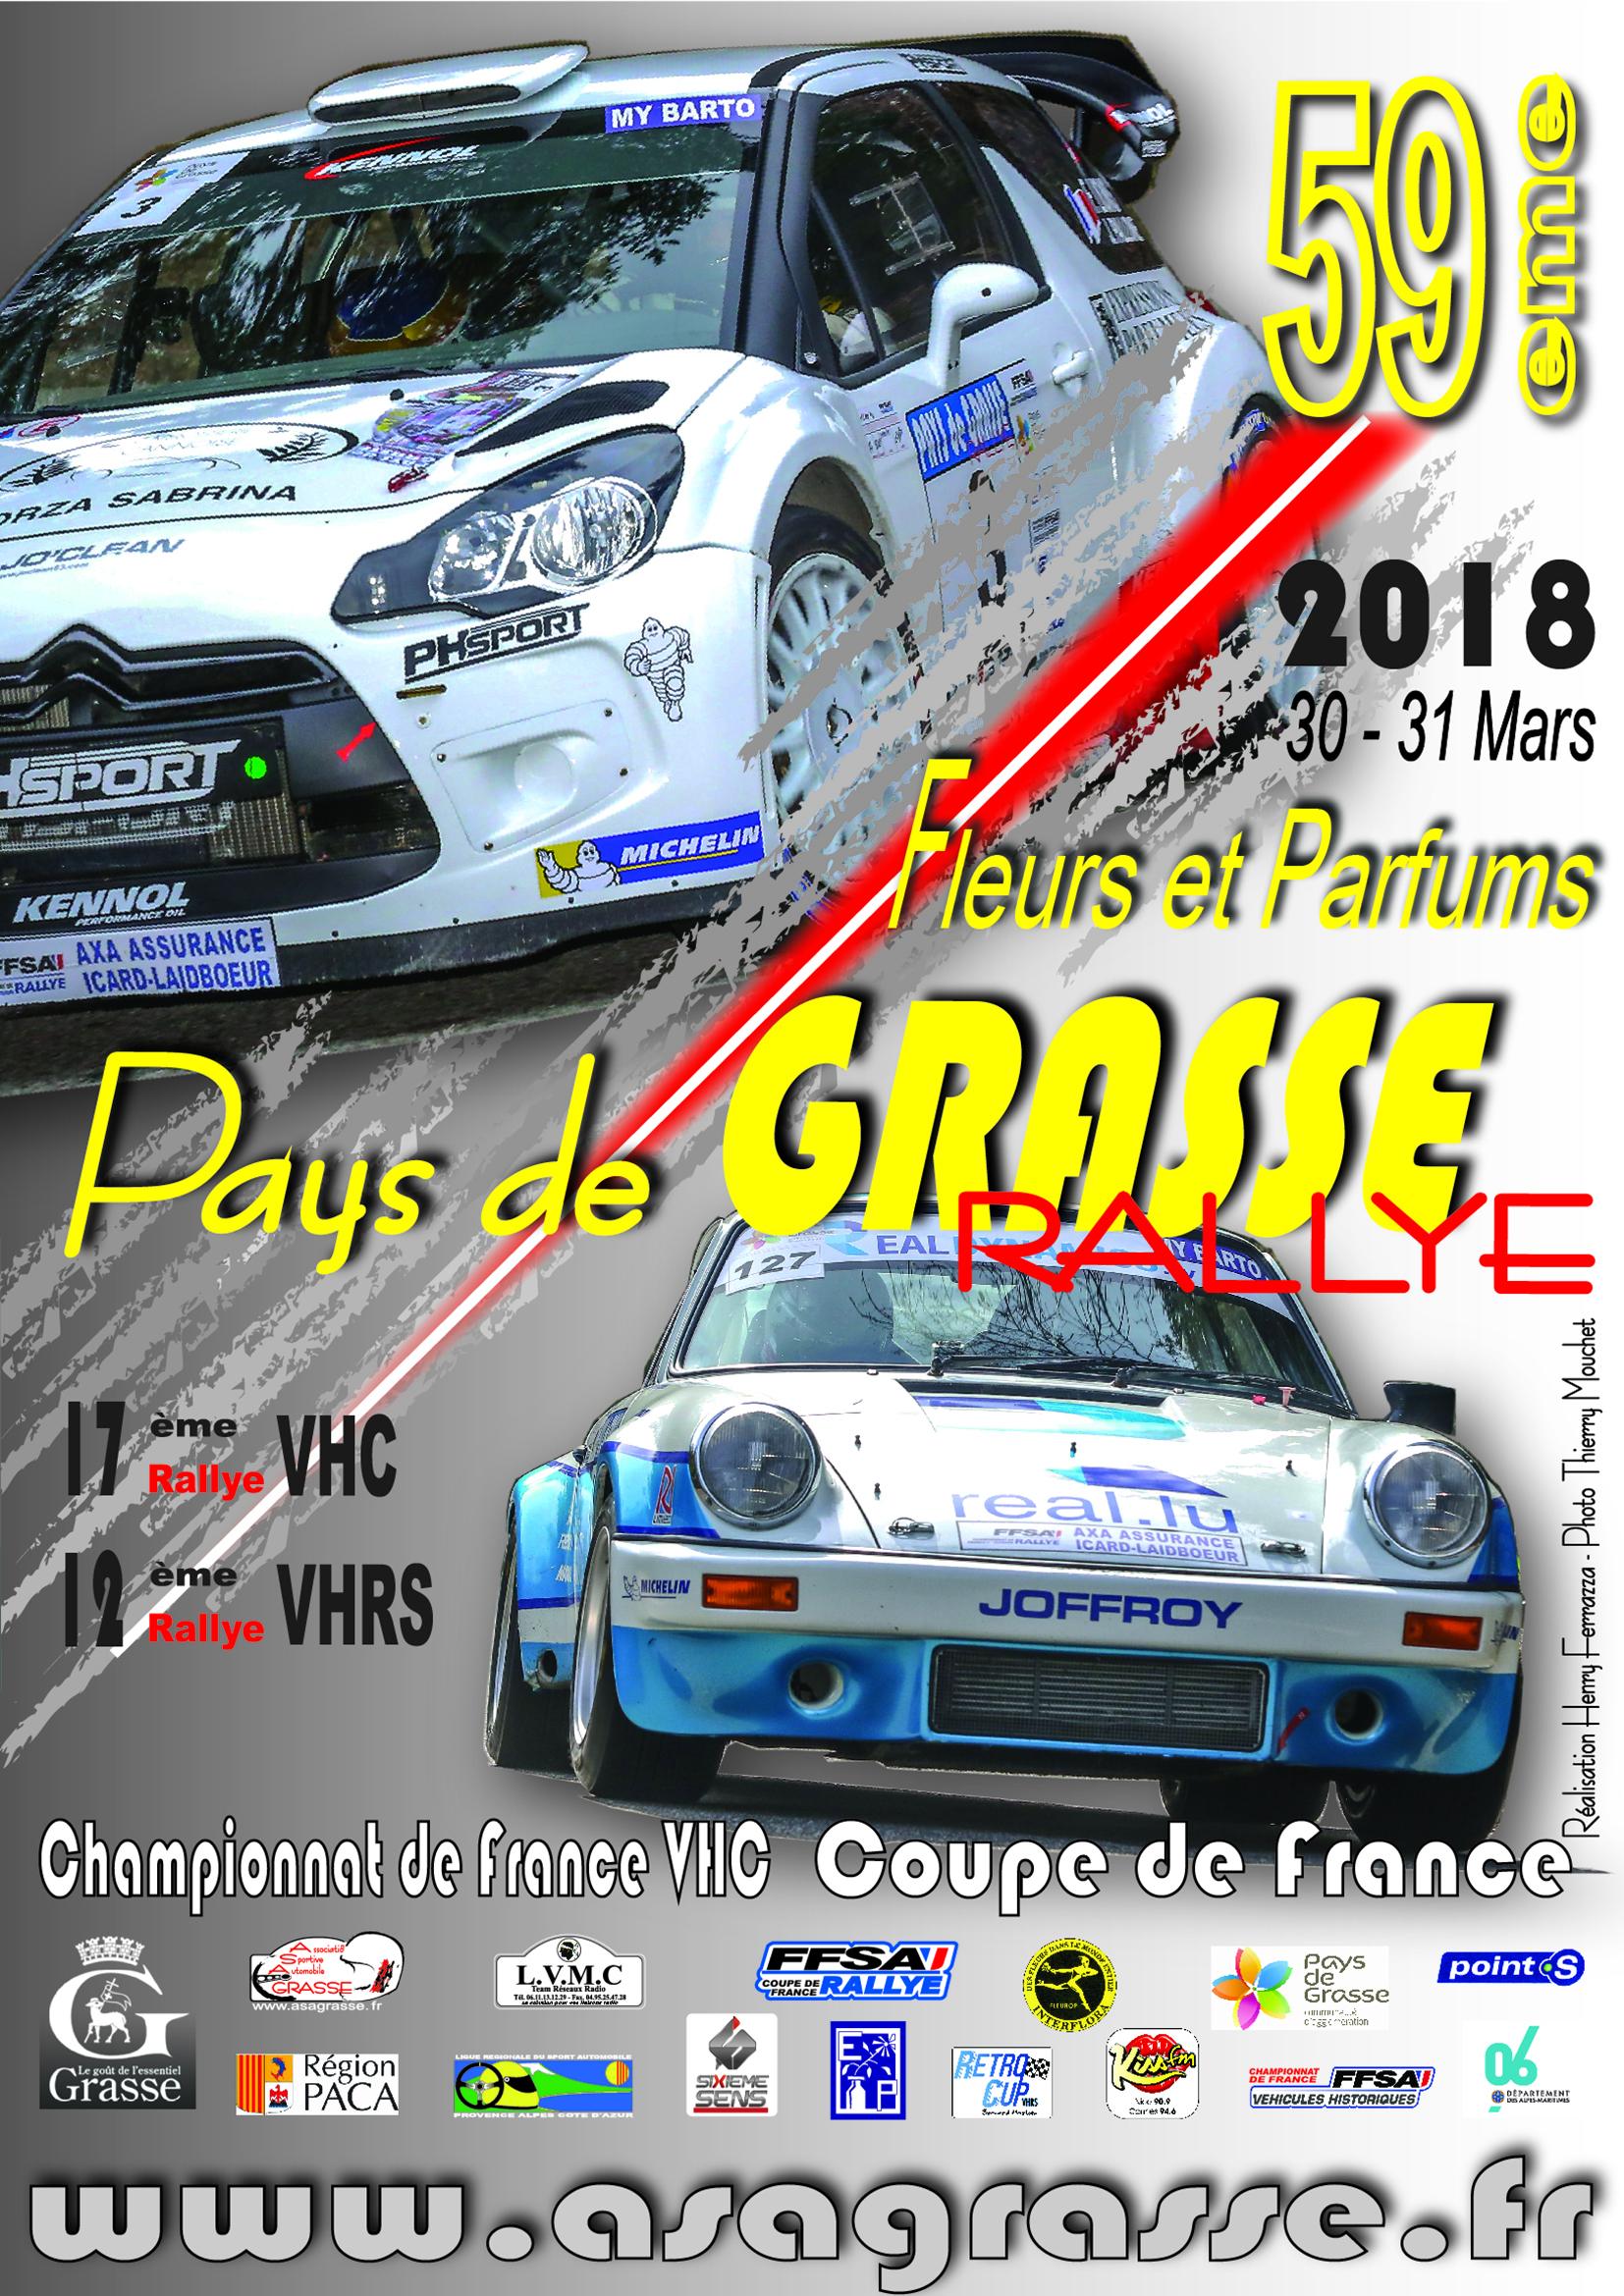 59eme_rally-Grasse_12_PAGE-AFFICHE-GRASSE-2018.jpg